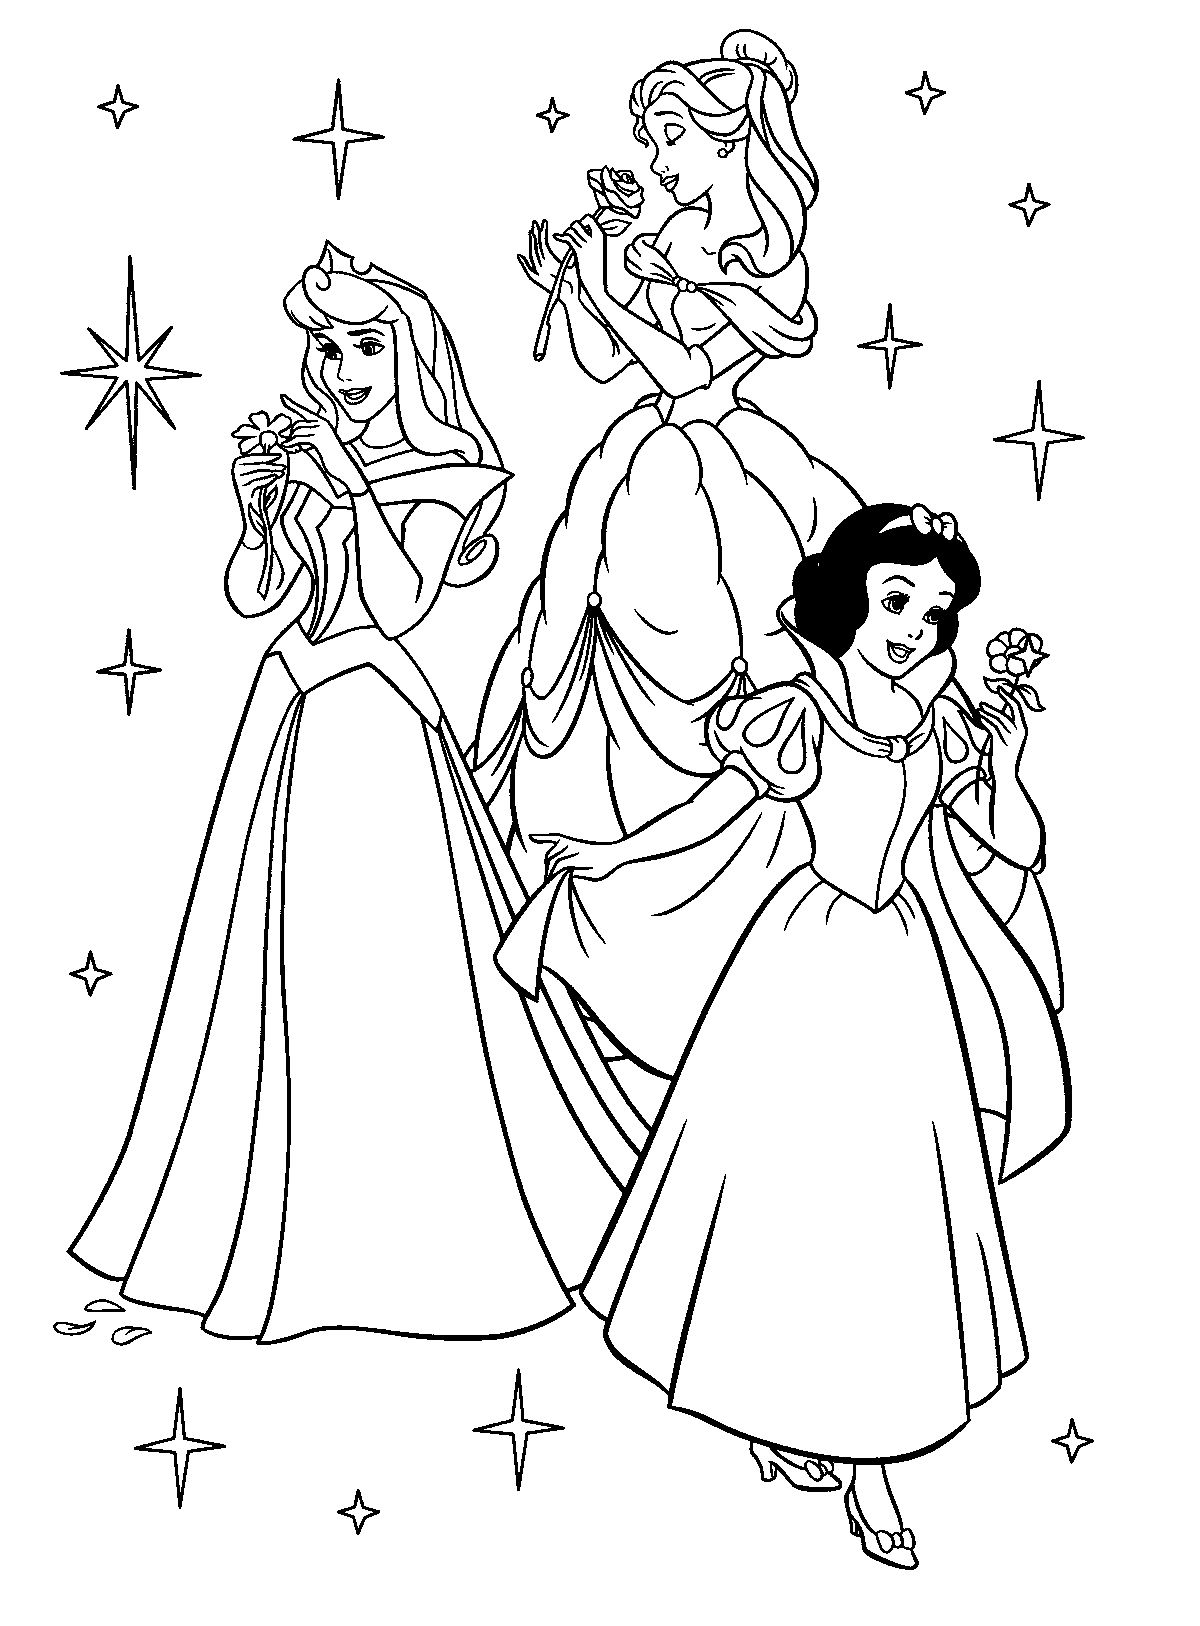 printable disney princess coloring pages # 1